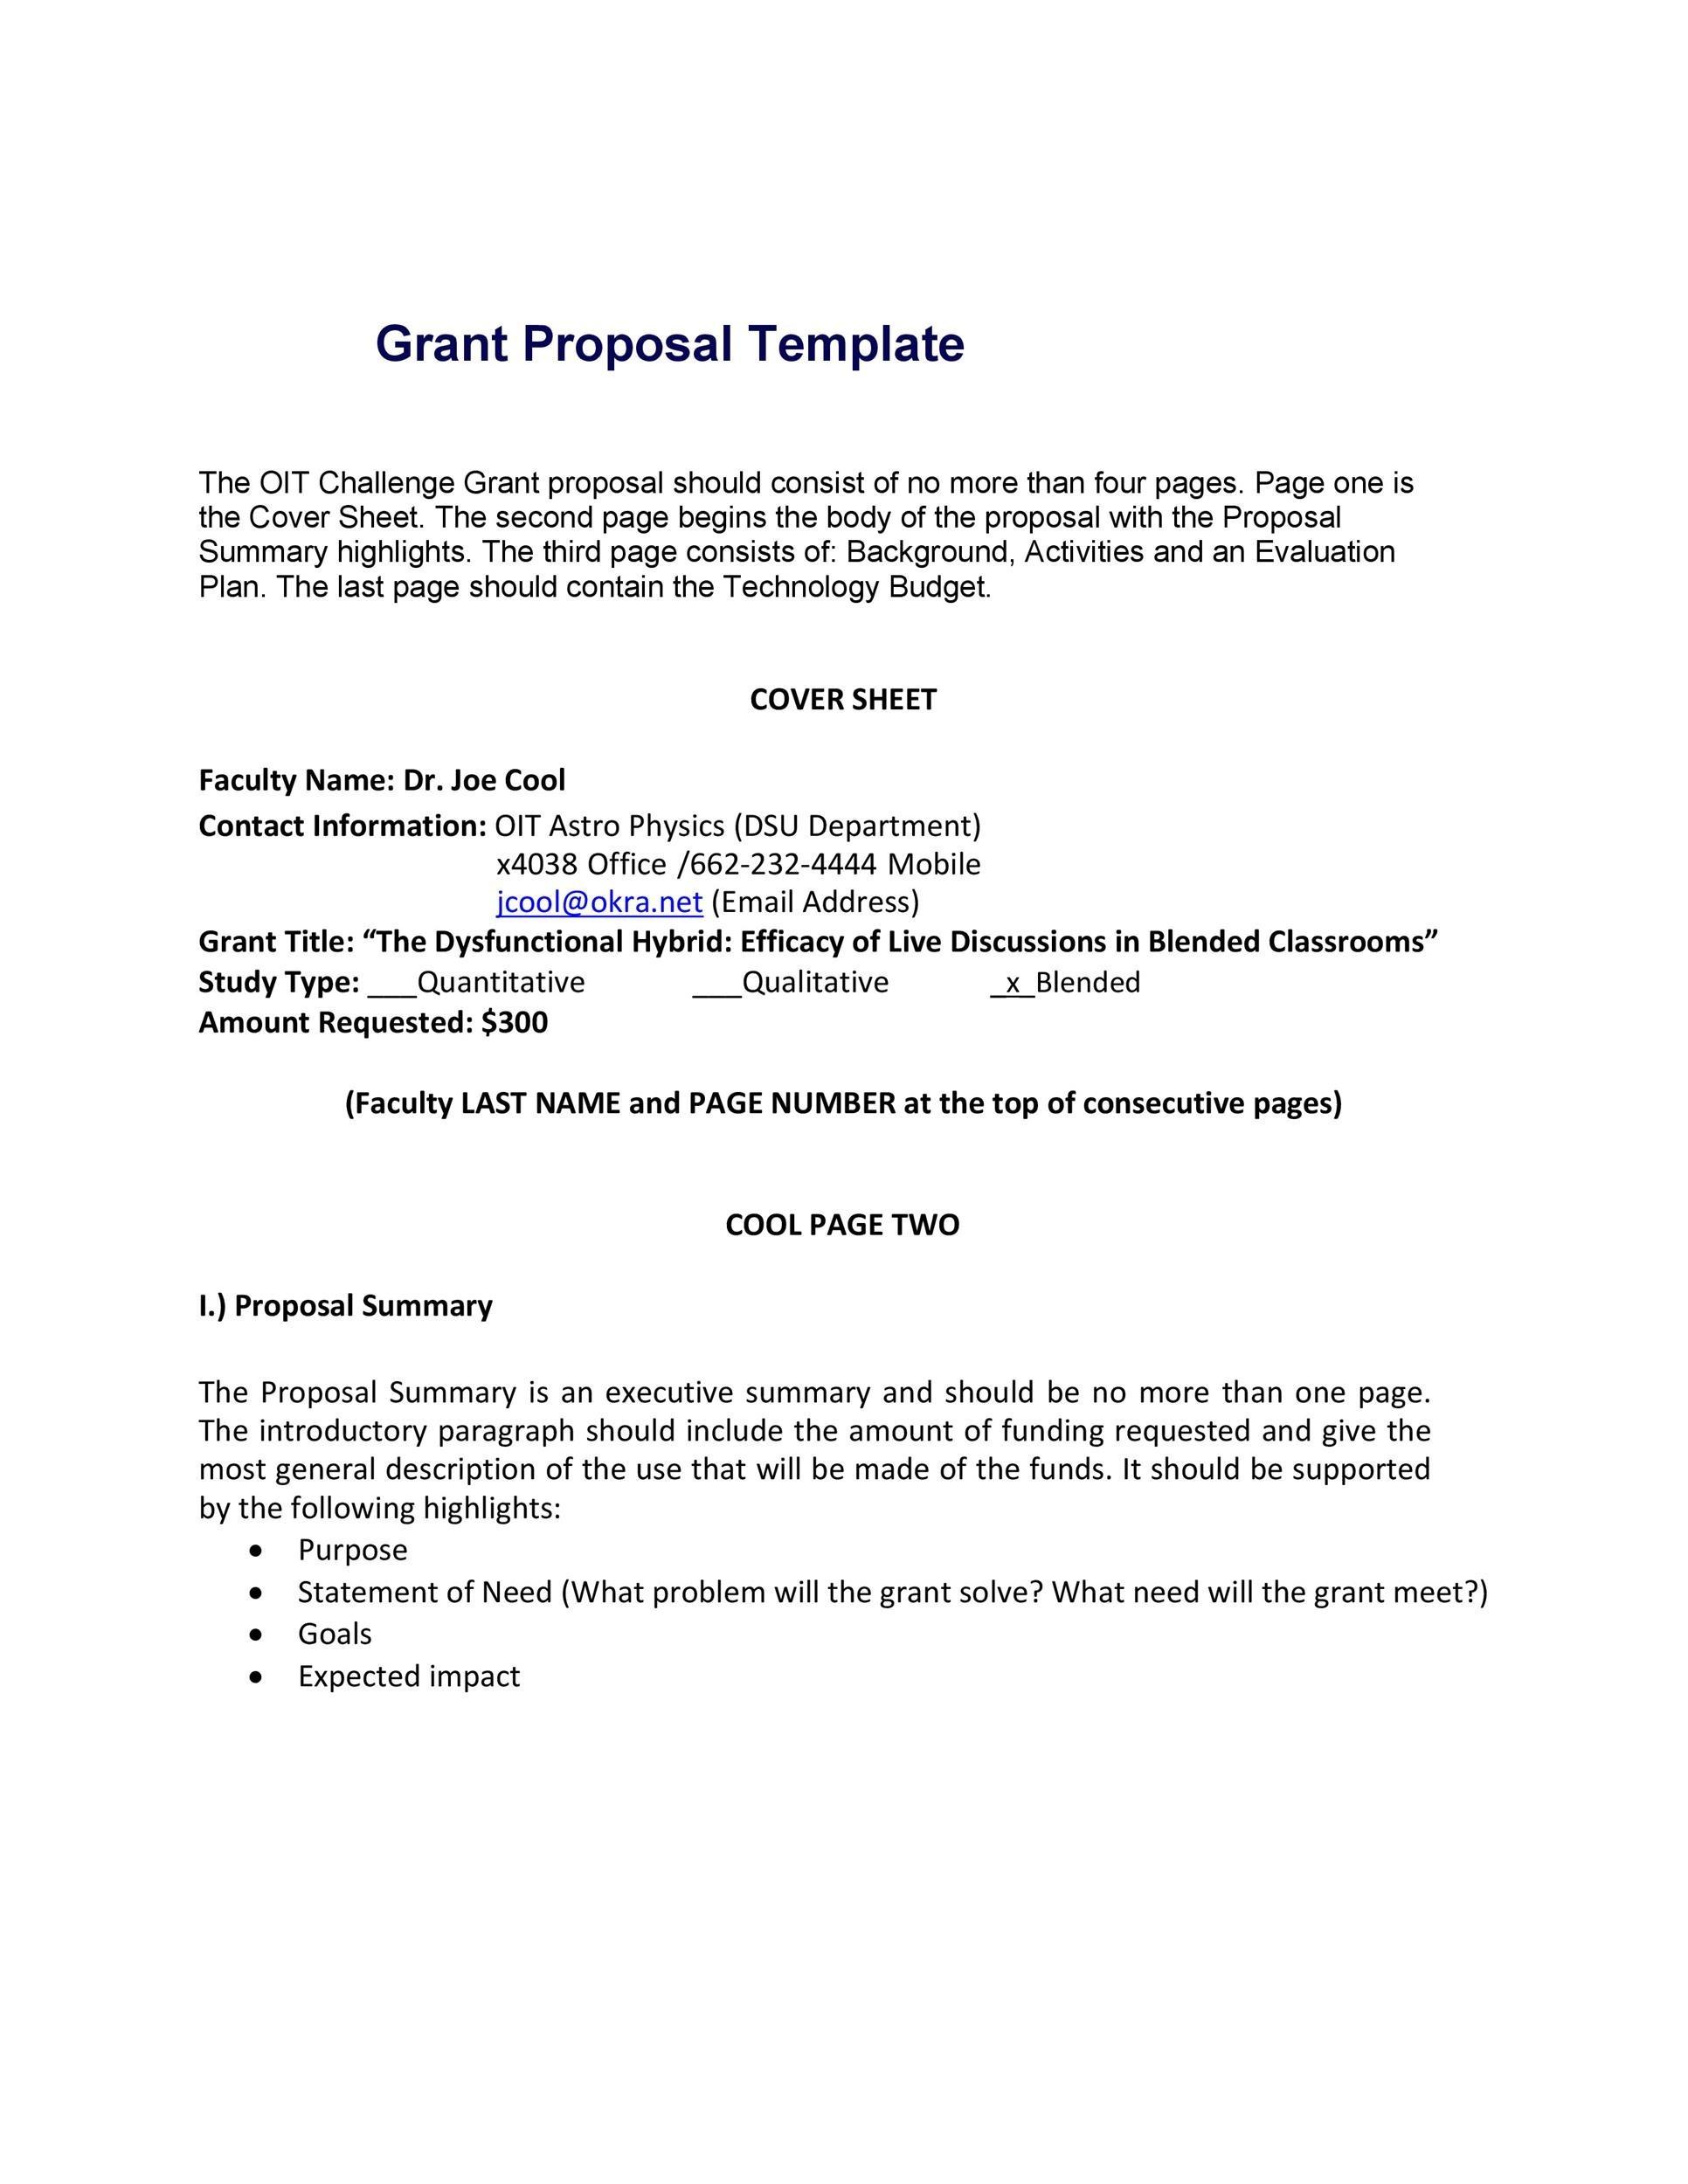 one page summary template templatebillybullock - non profit proposal template